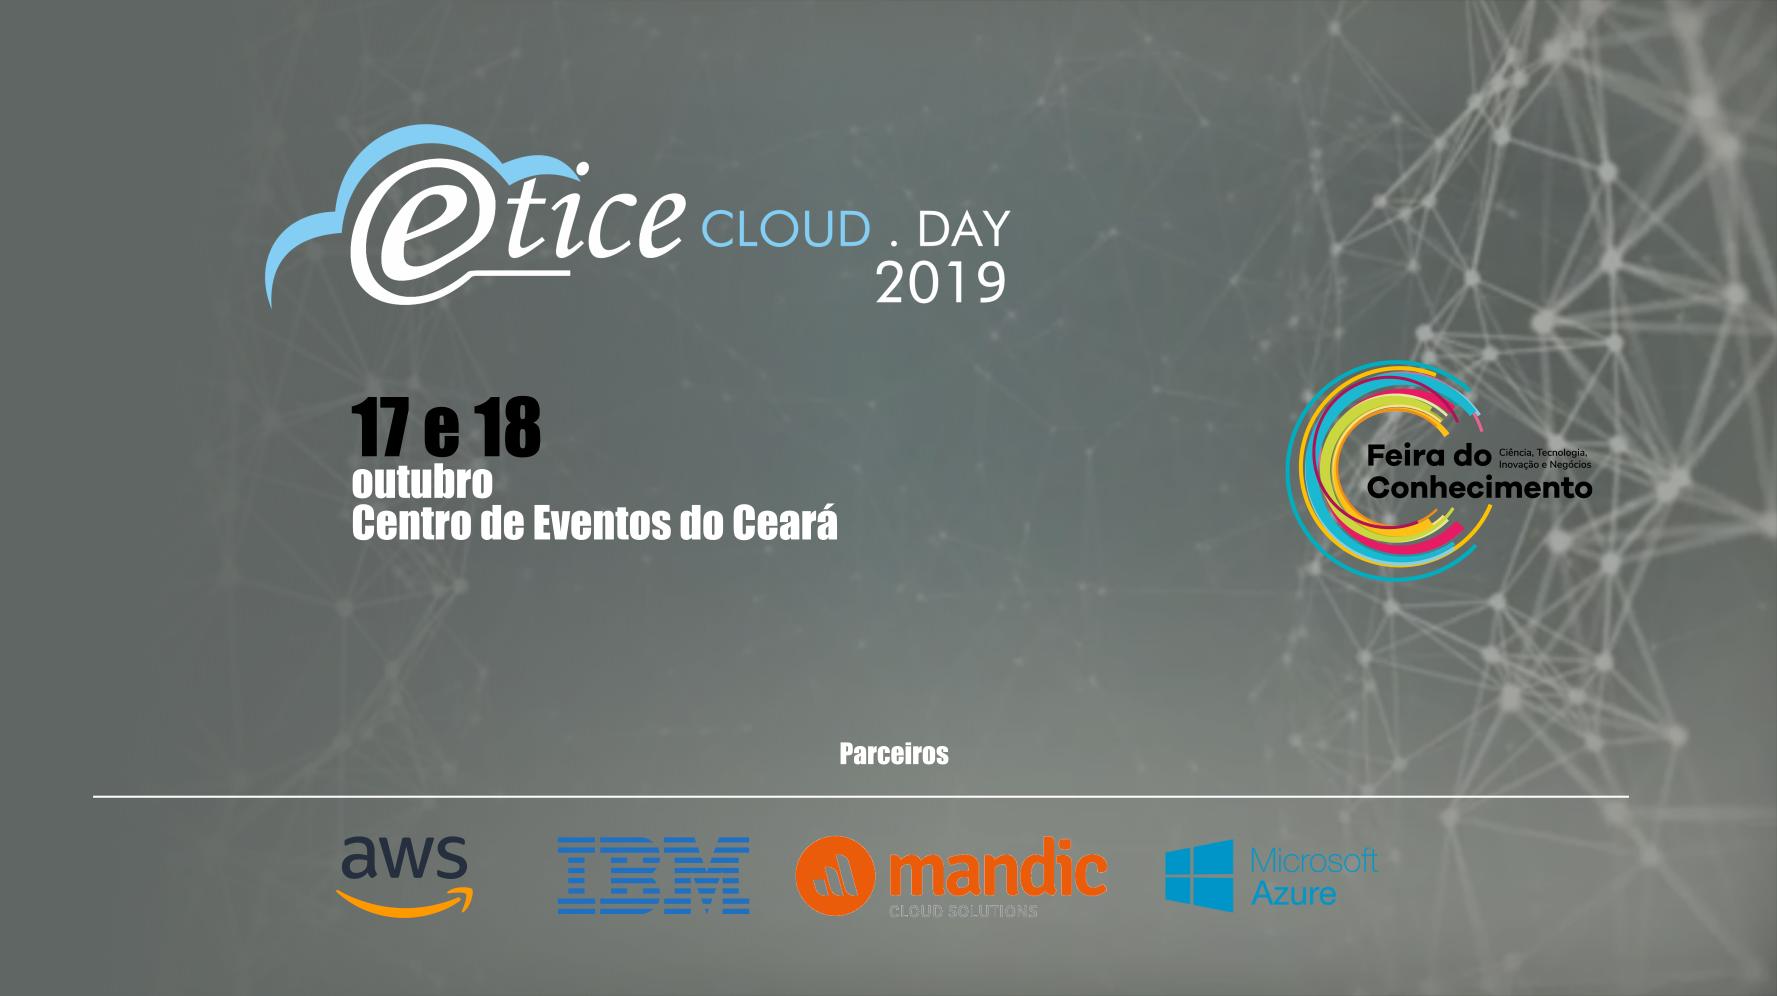 II Etice Cloud Day